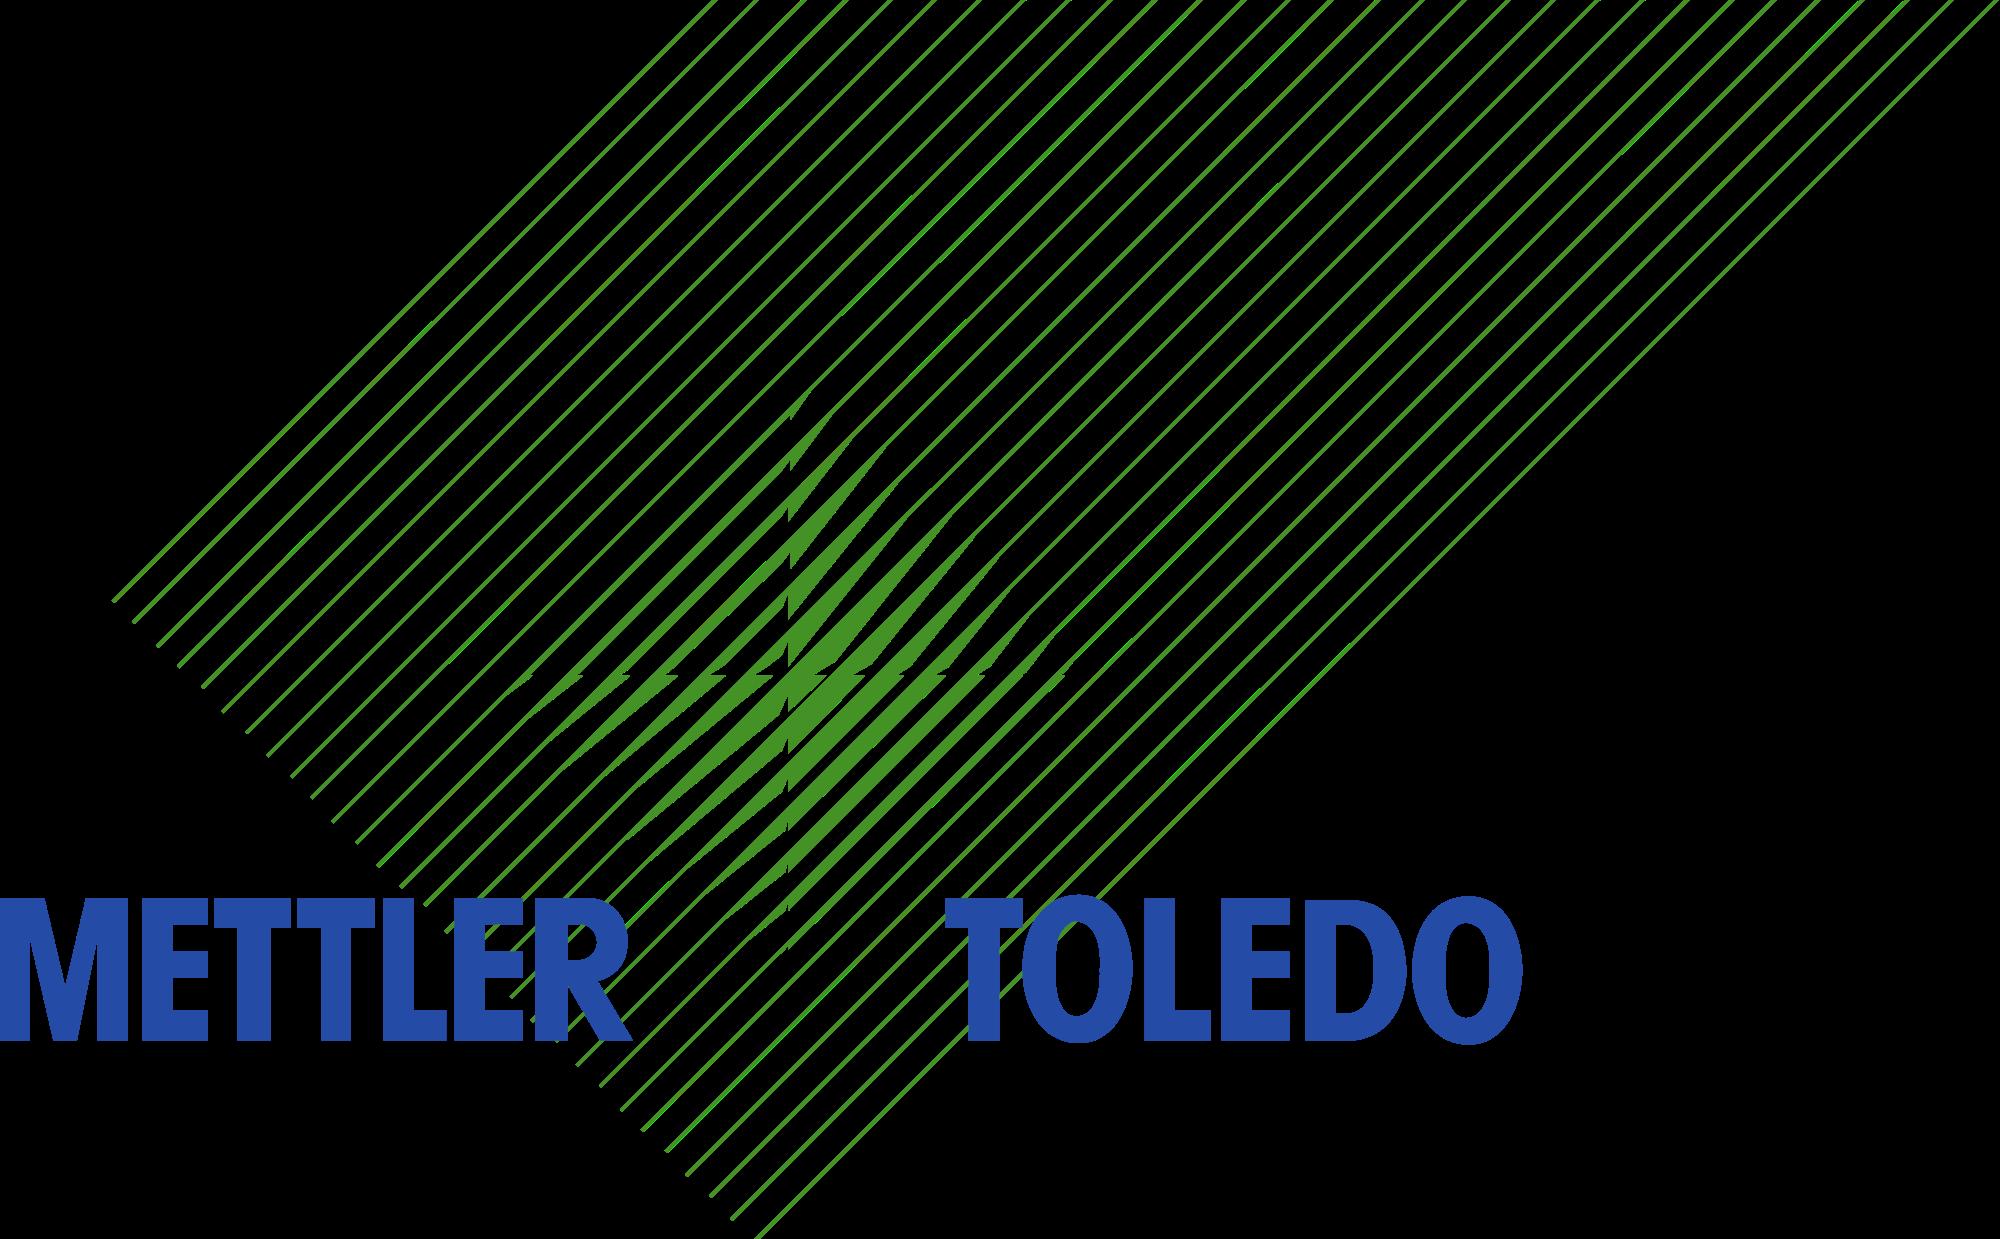 Mettler Toledo bündelt Kapazitäten in Heppenheim